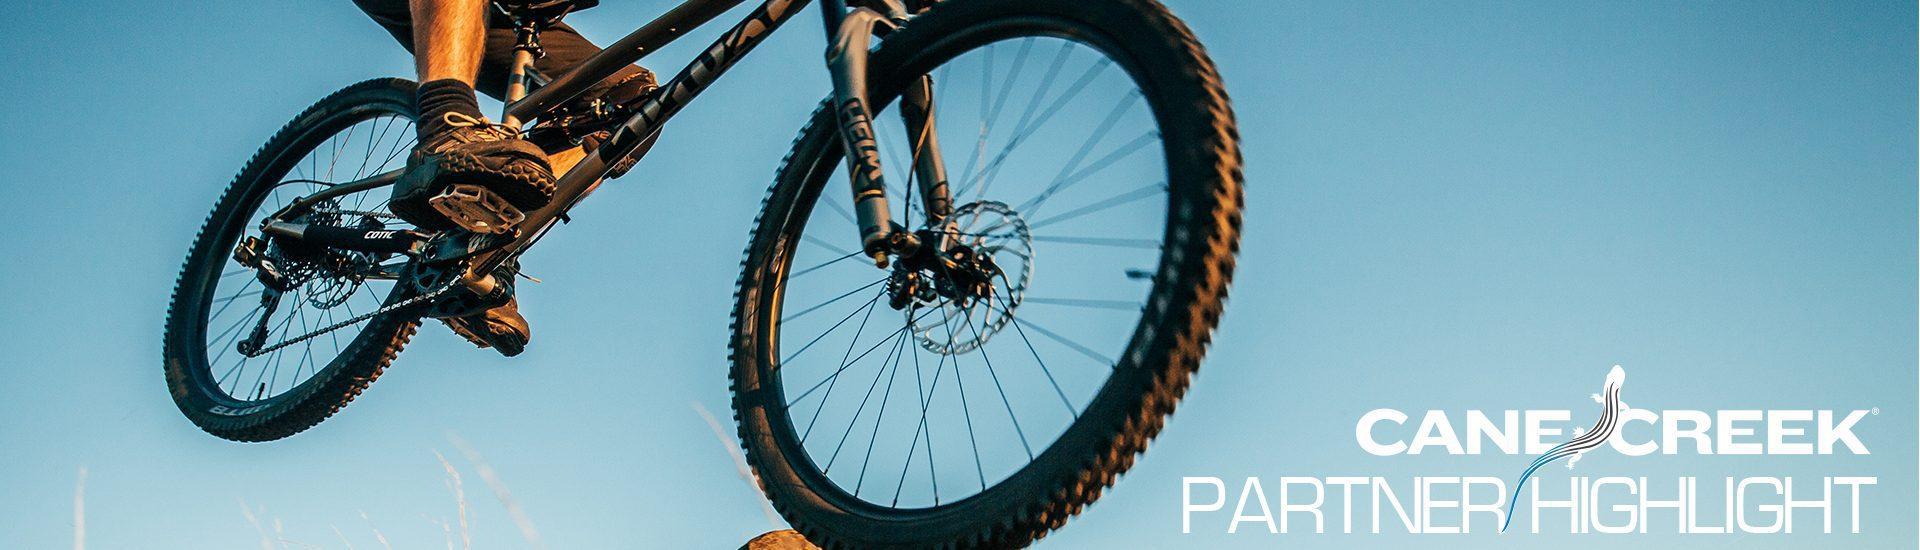 Cane Creek Partner Highlight: Cotic Bikes